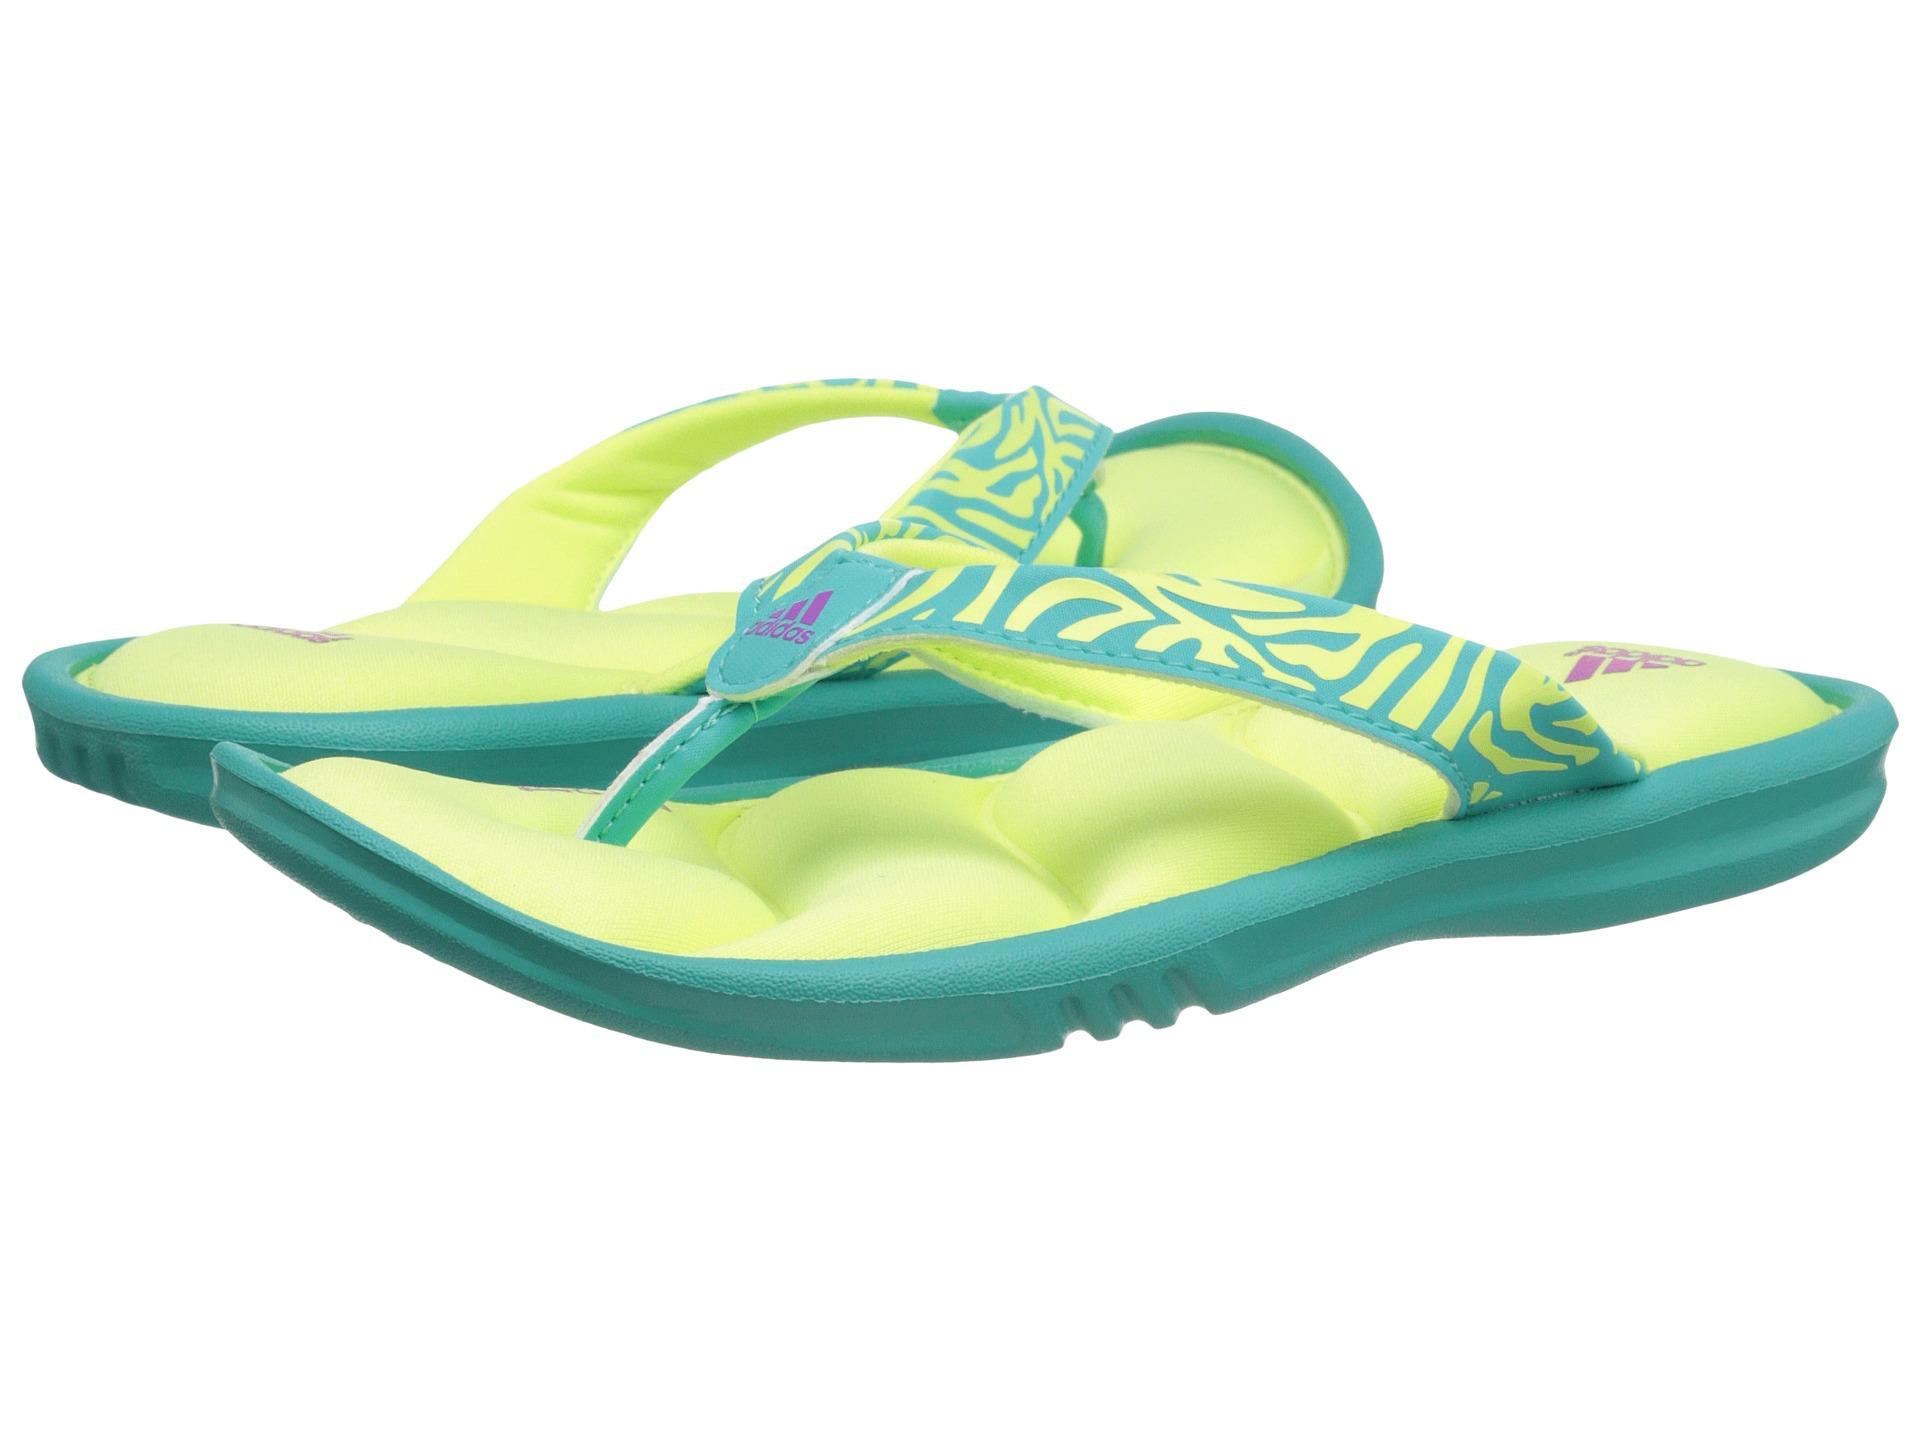 0e1a6cc2ca9e adidas flip flops kids yellow on sale   OFF55% Discounts